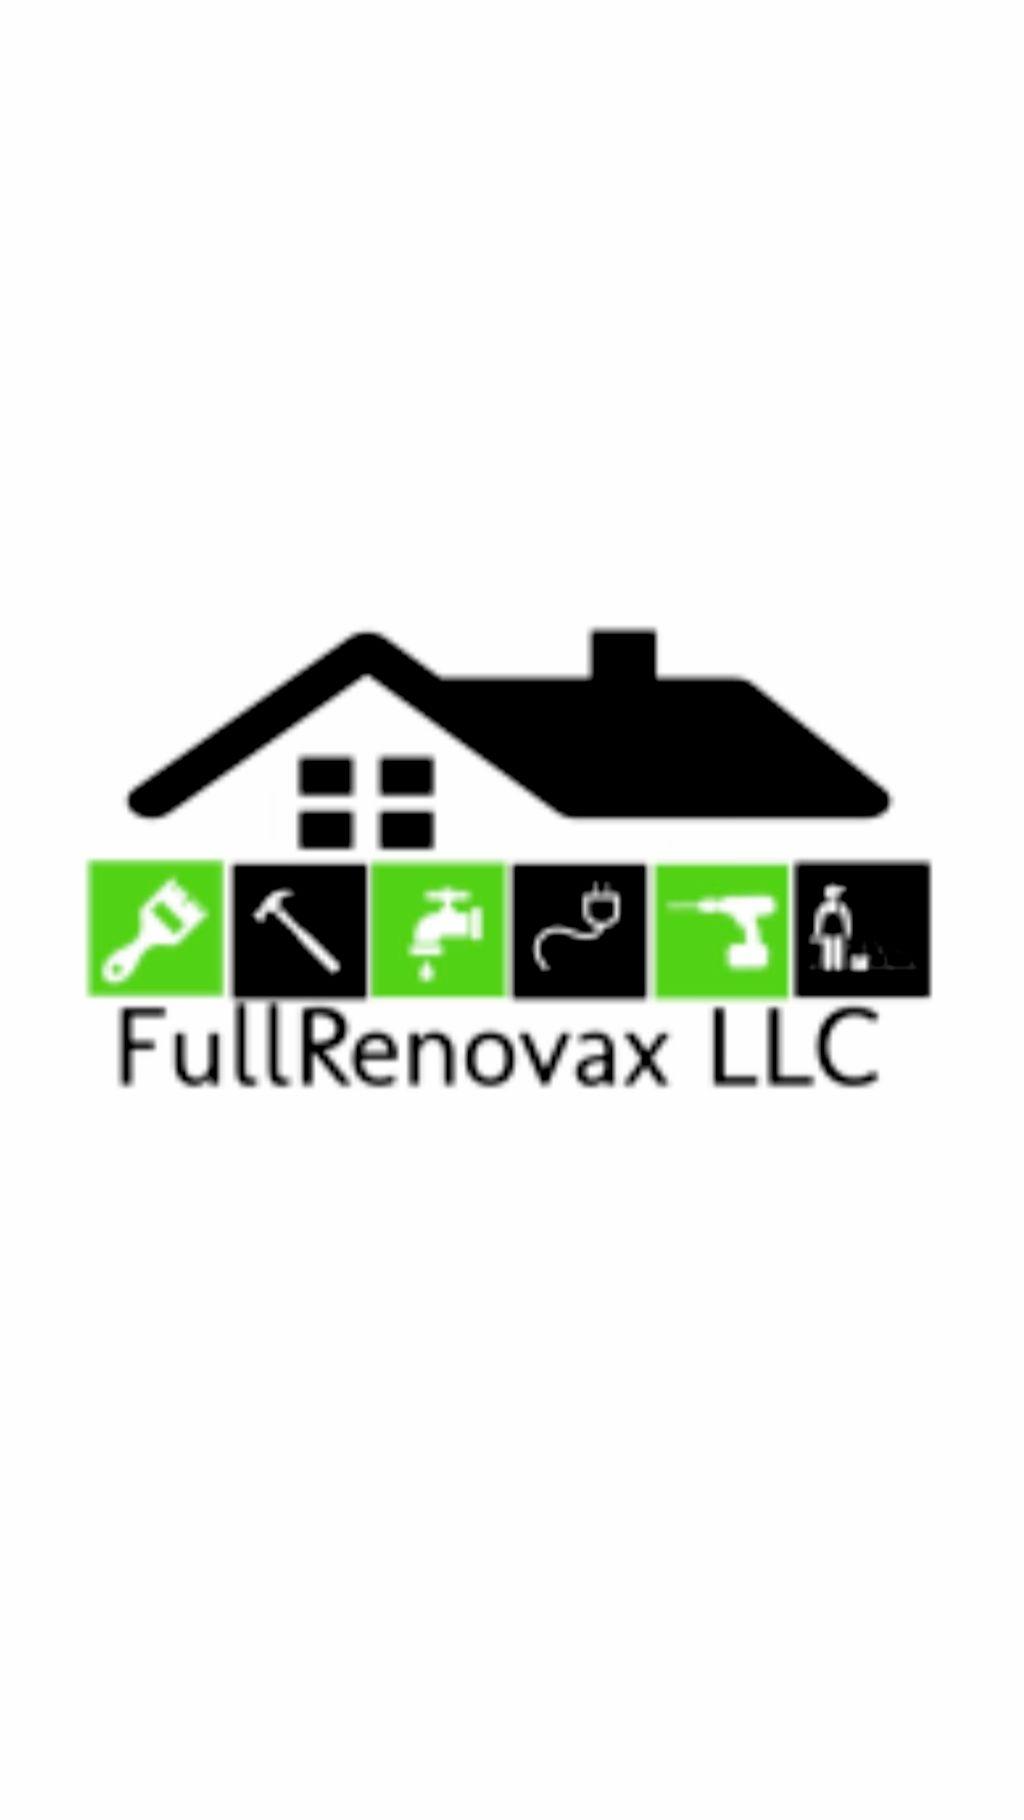 FullRenovax LLC